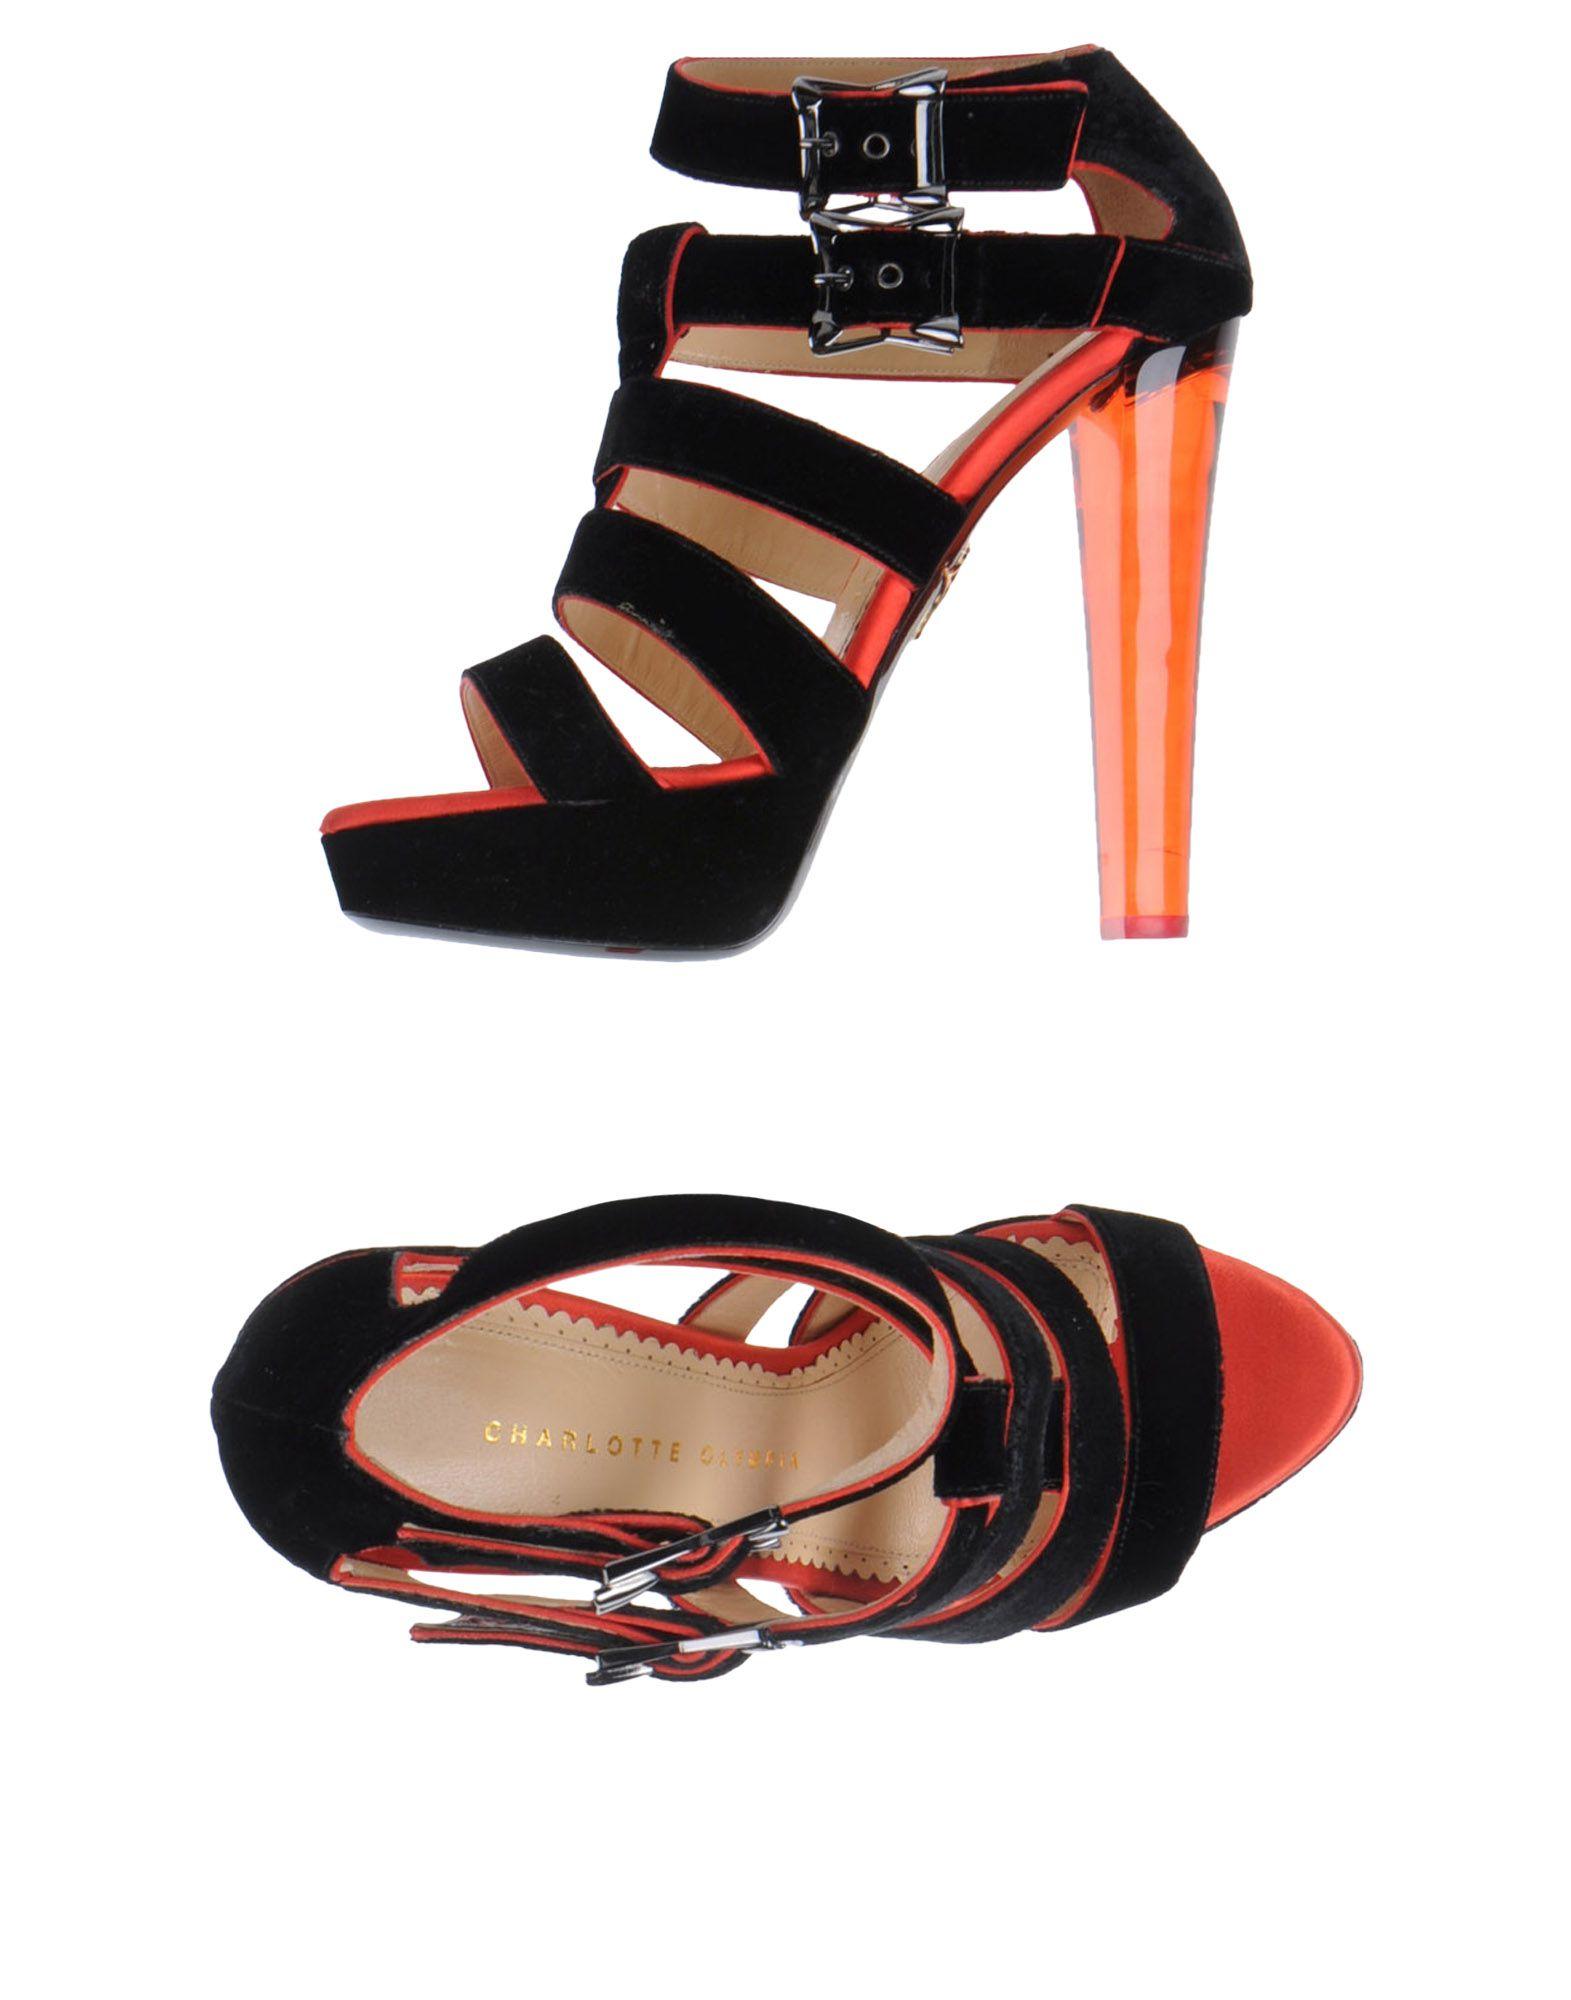 Фото - CHARLOTTE OLYMPIA Босоножки на платформе обувь на высокой платформе dkny